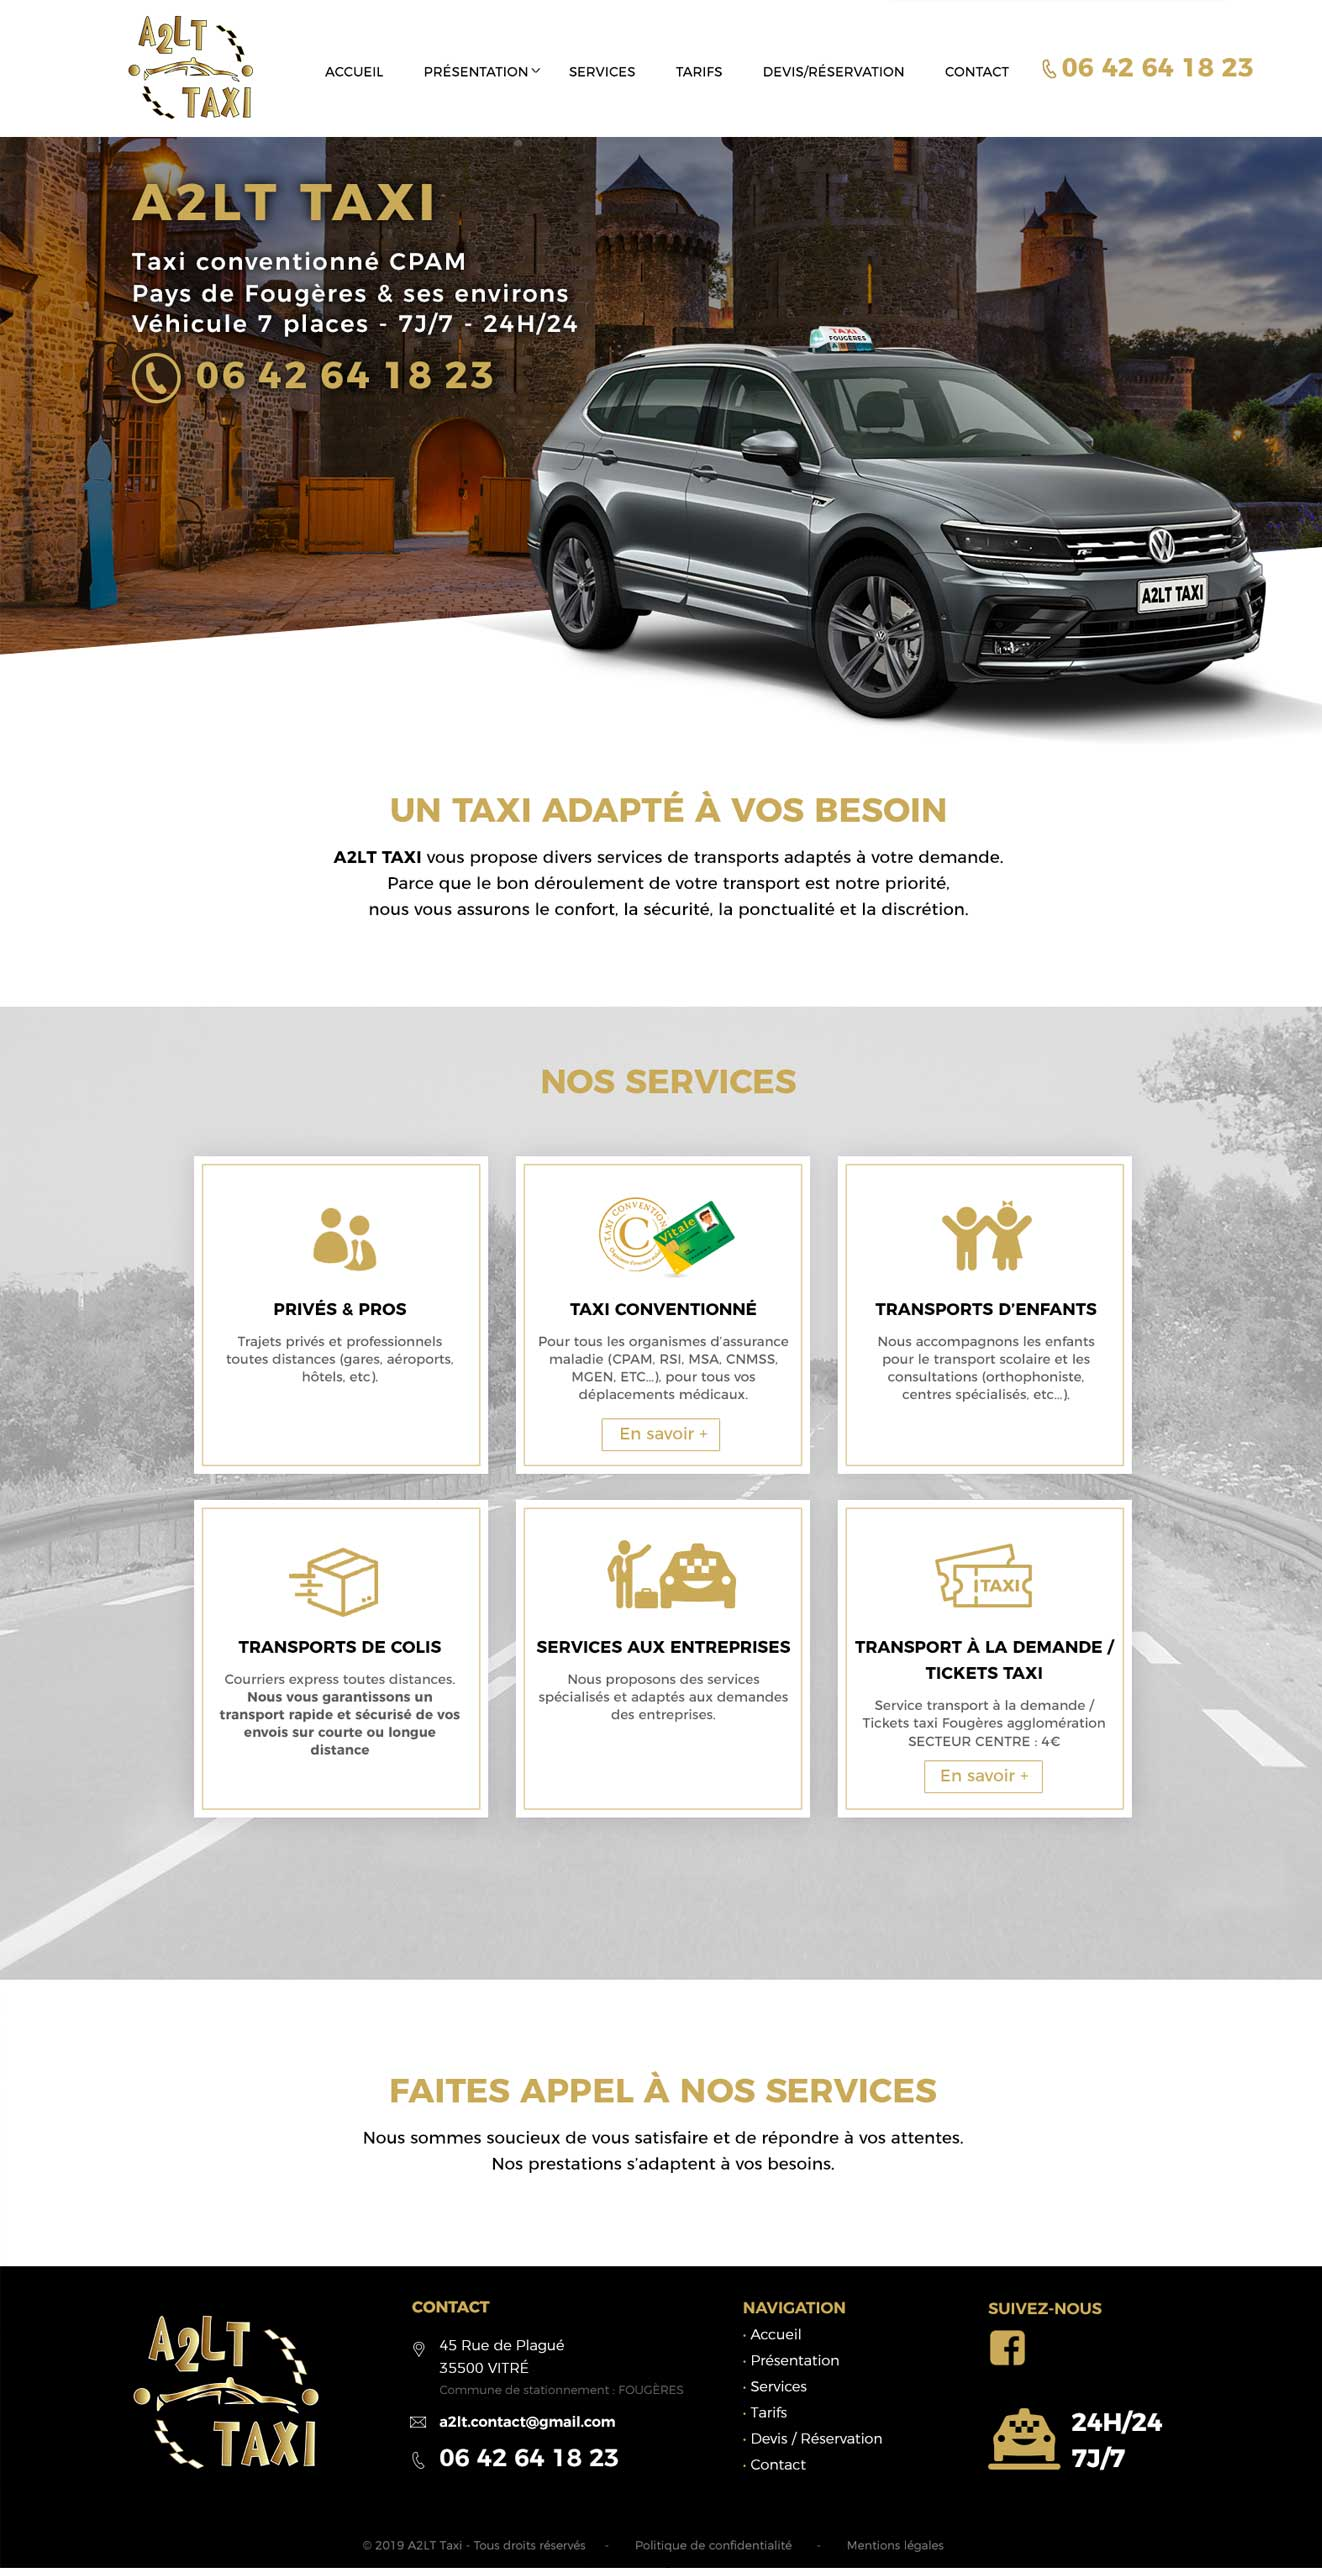 webdesign A2LT Taxi